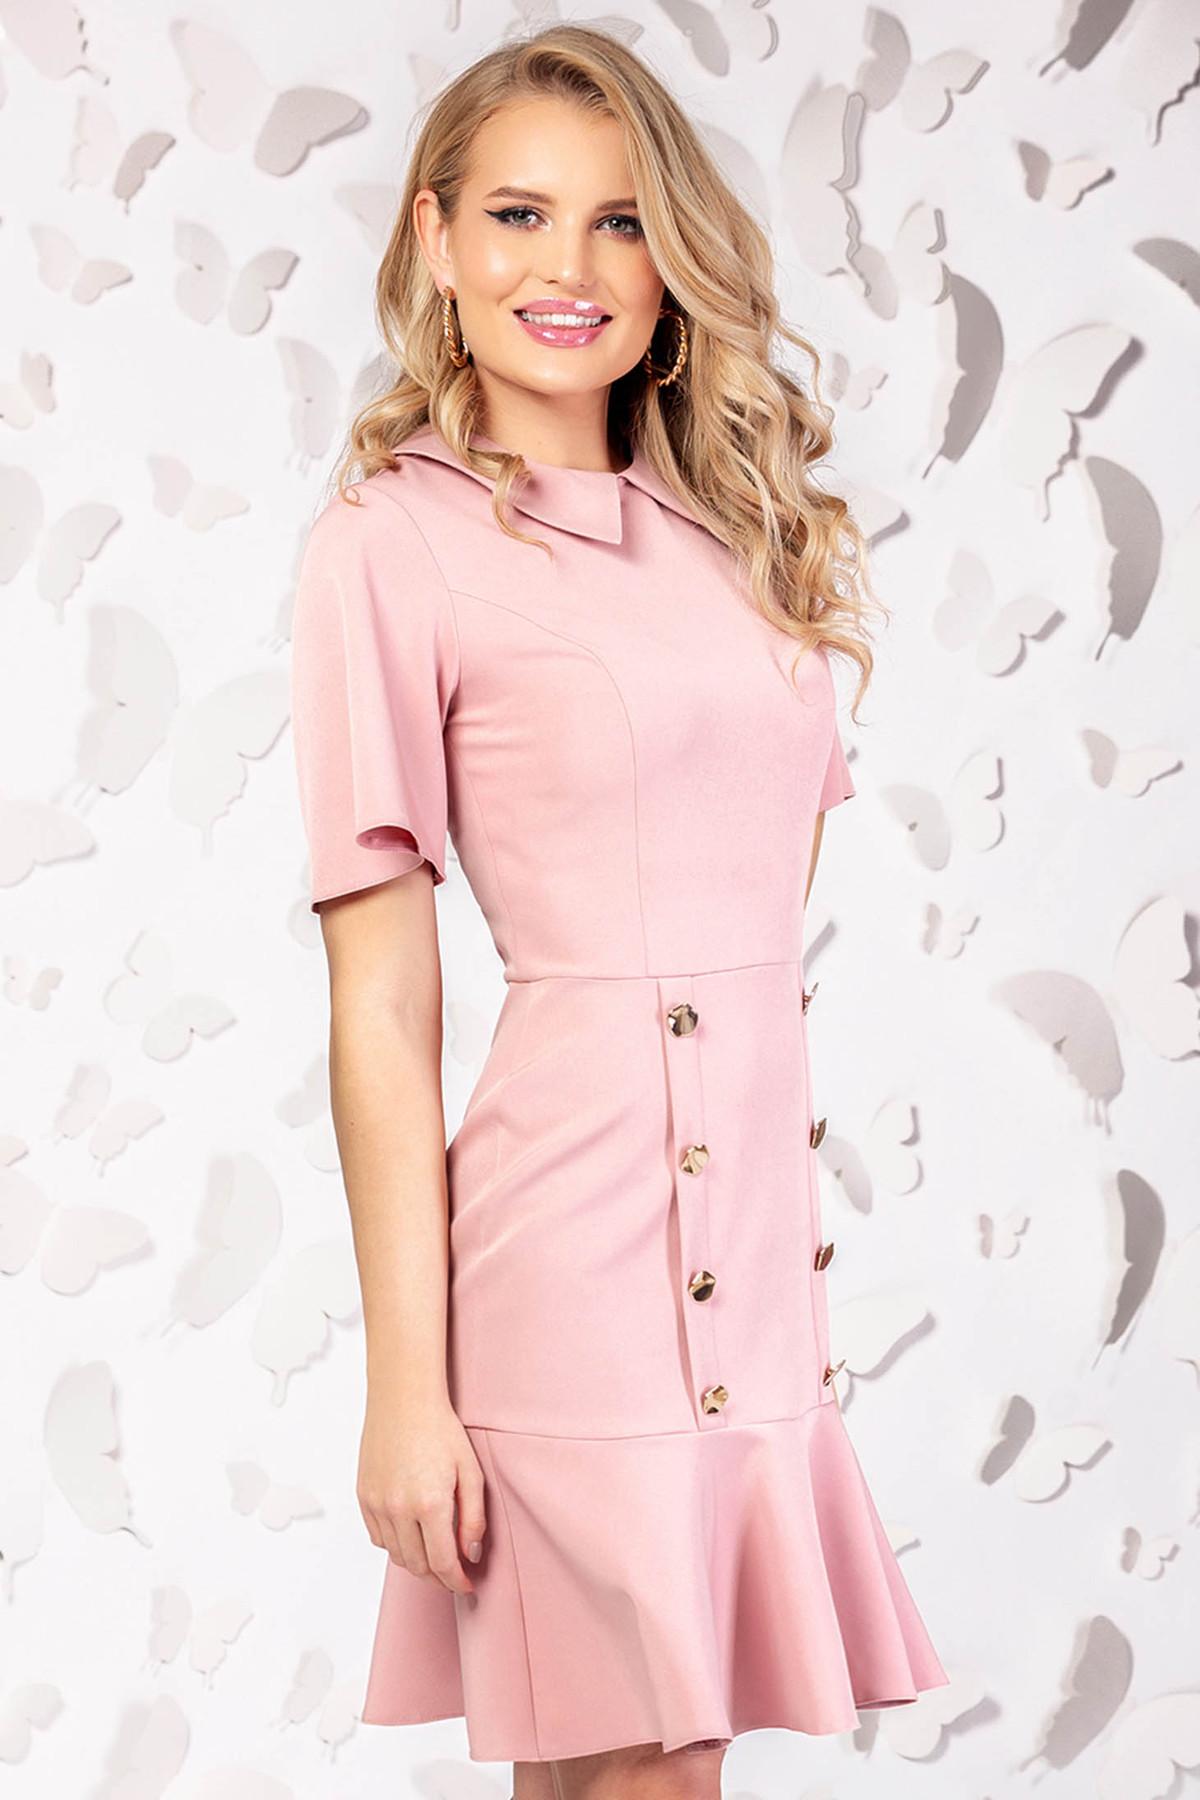 Rochie PrettyGirl roz prafuit eleganta scurta in clos cu maneci largi accesorizata cu nasturi